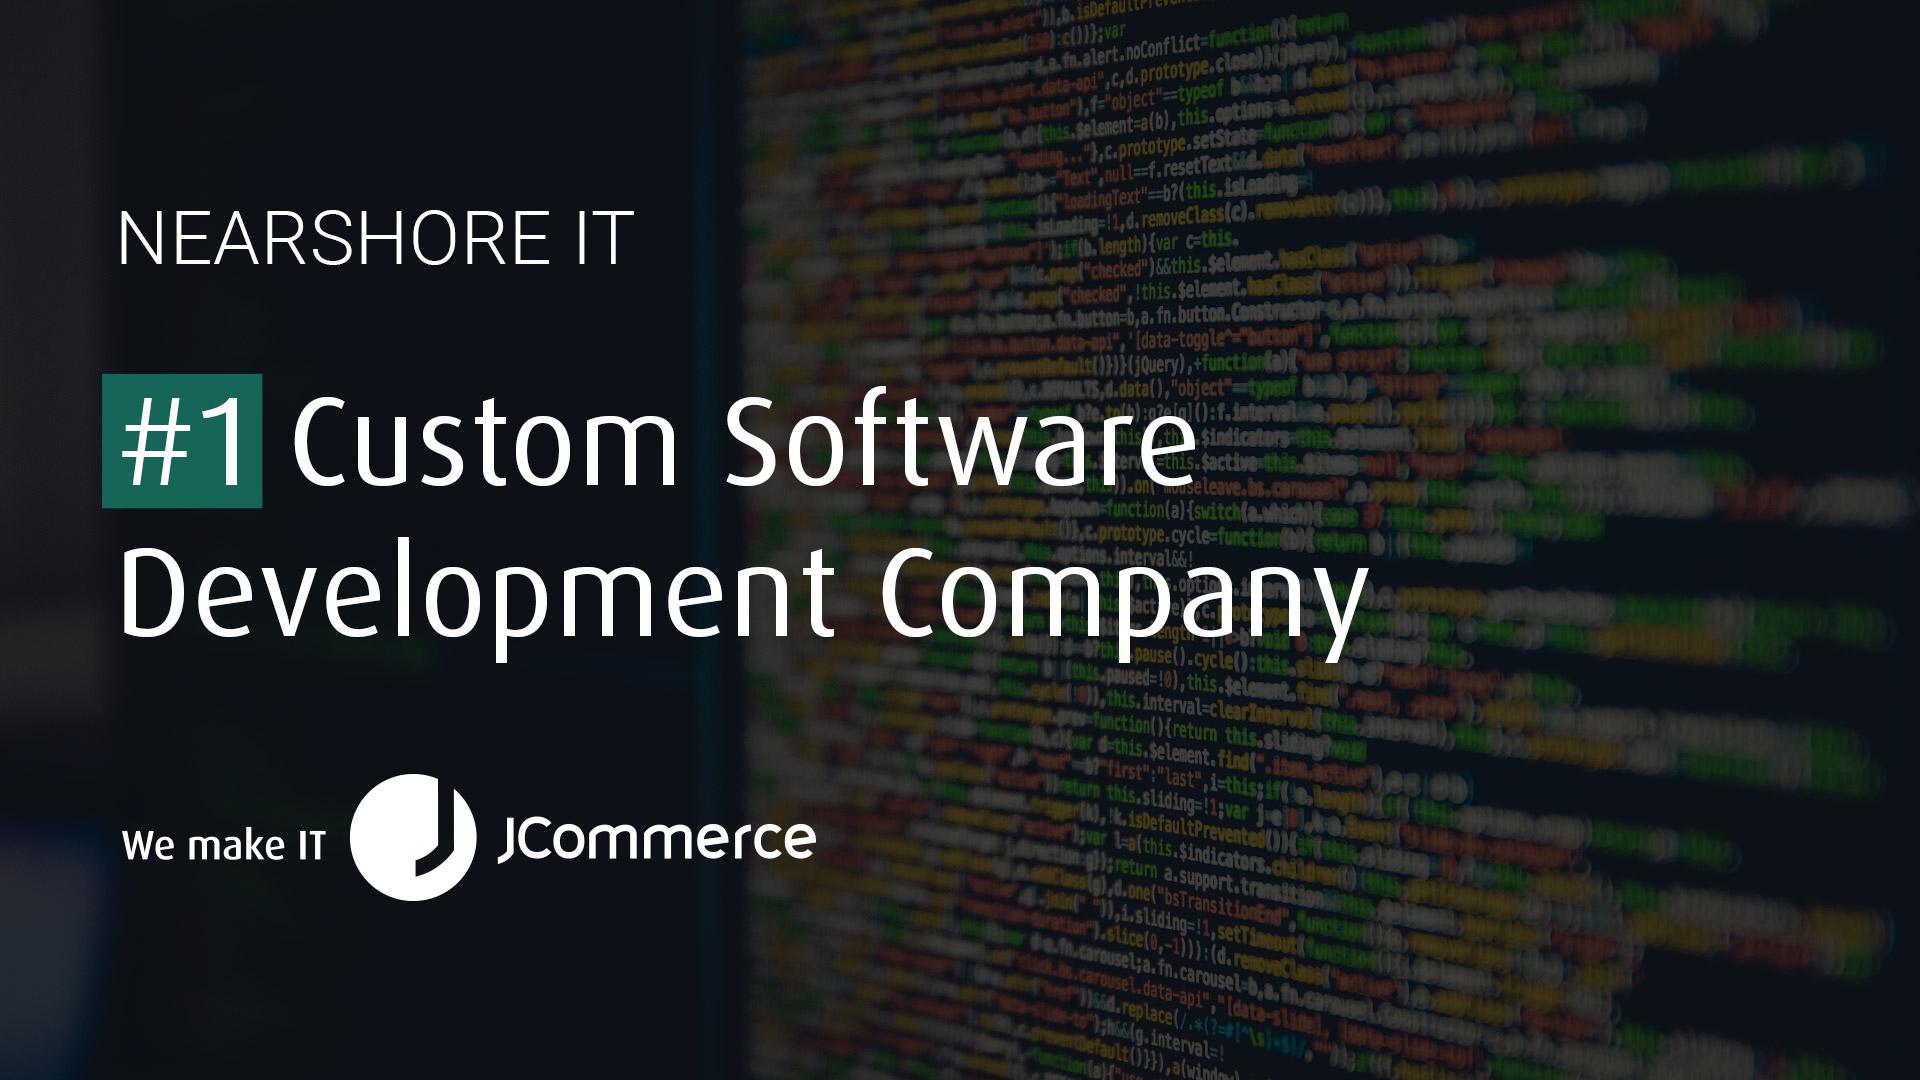 FinTech Software Development | Financial Software | Nearshore IT